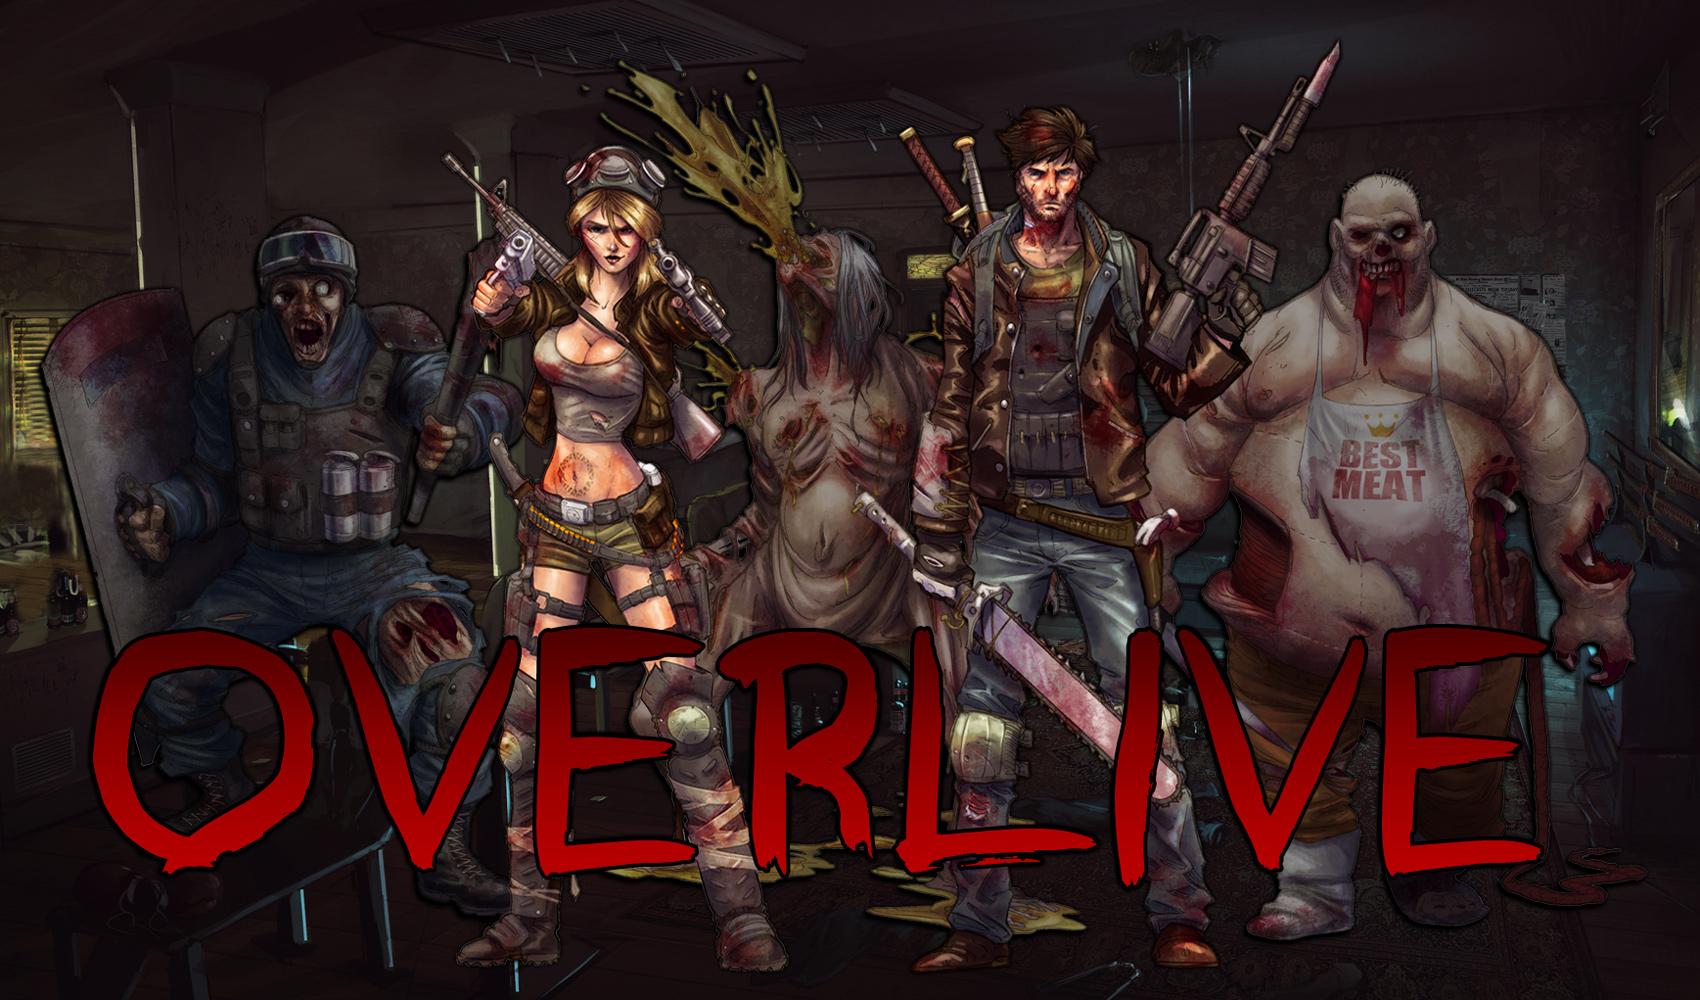 overlive zombie apocalypse survival rpg adventure game